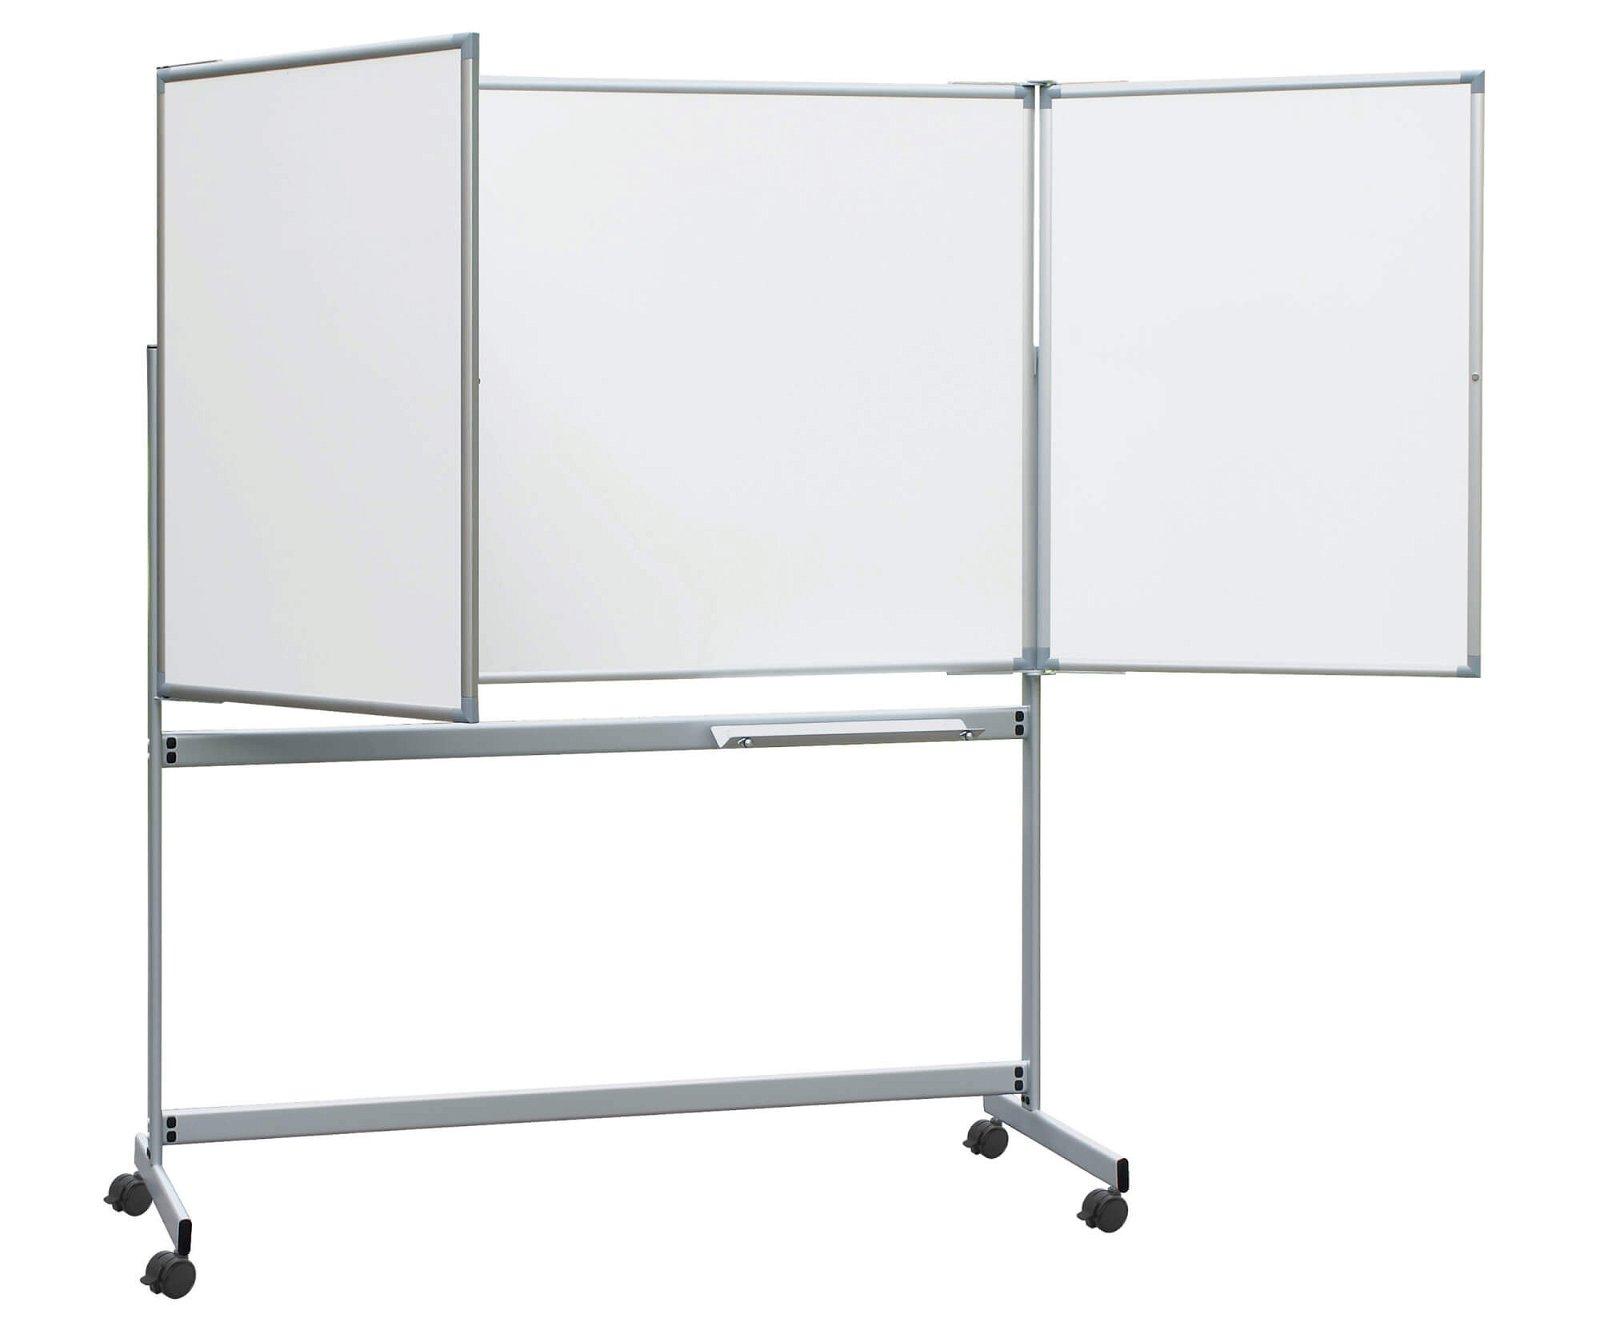 Mobile Klapptafel MAULpro, 100x150 cm, grau